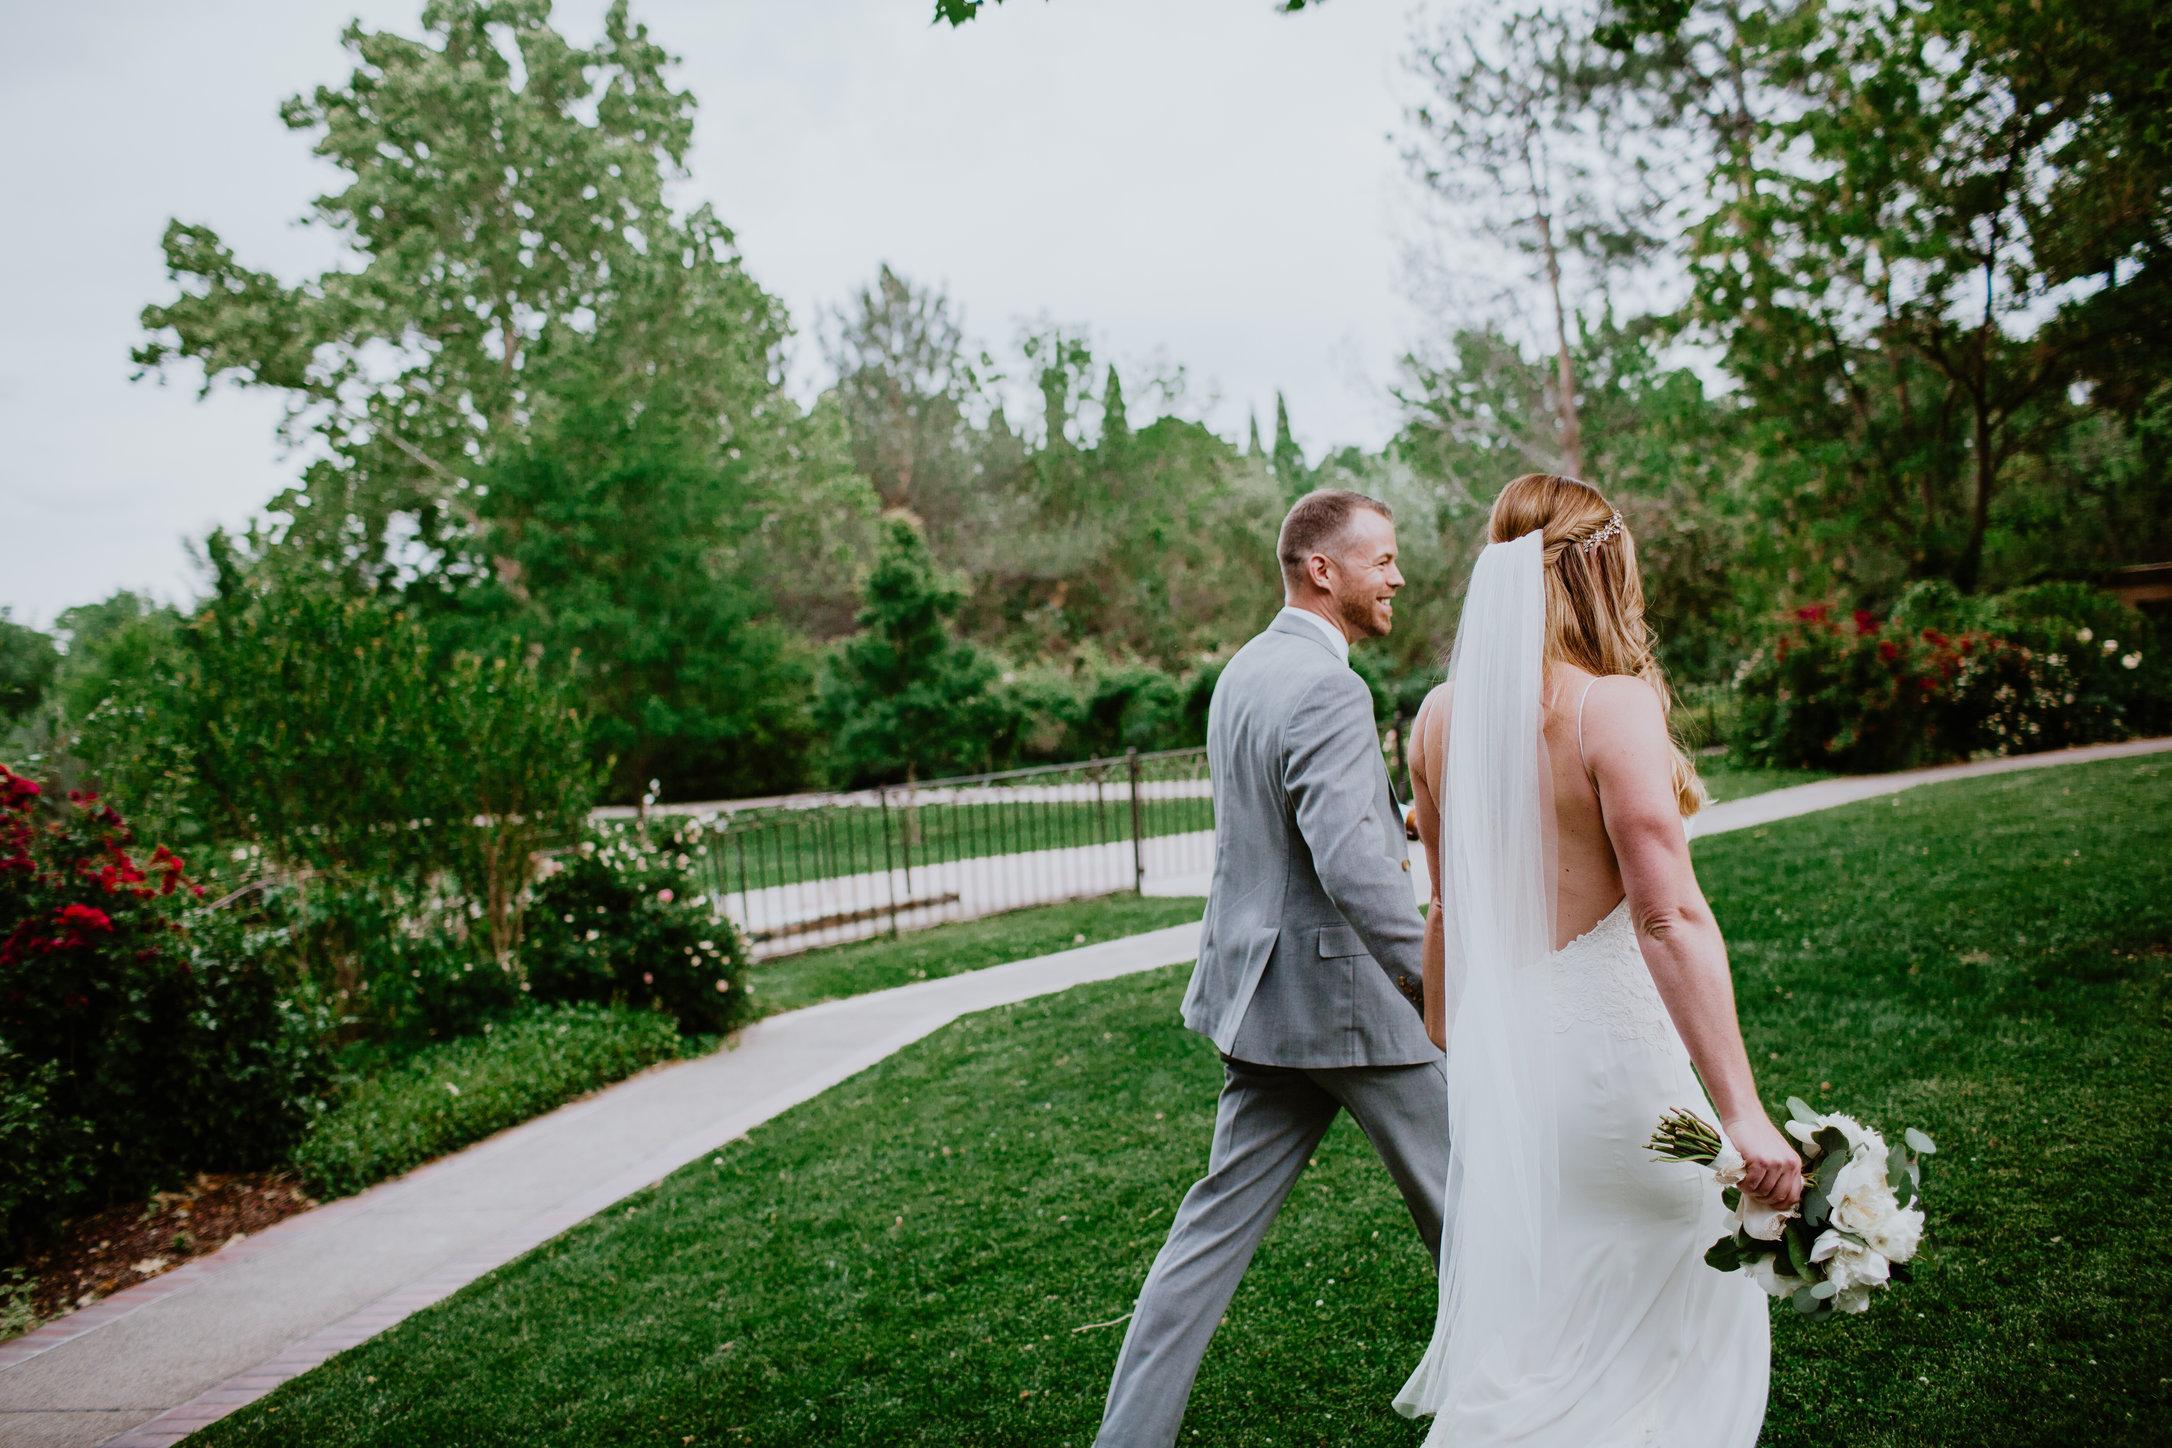 DandA-wedding-564.jpg